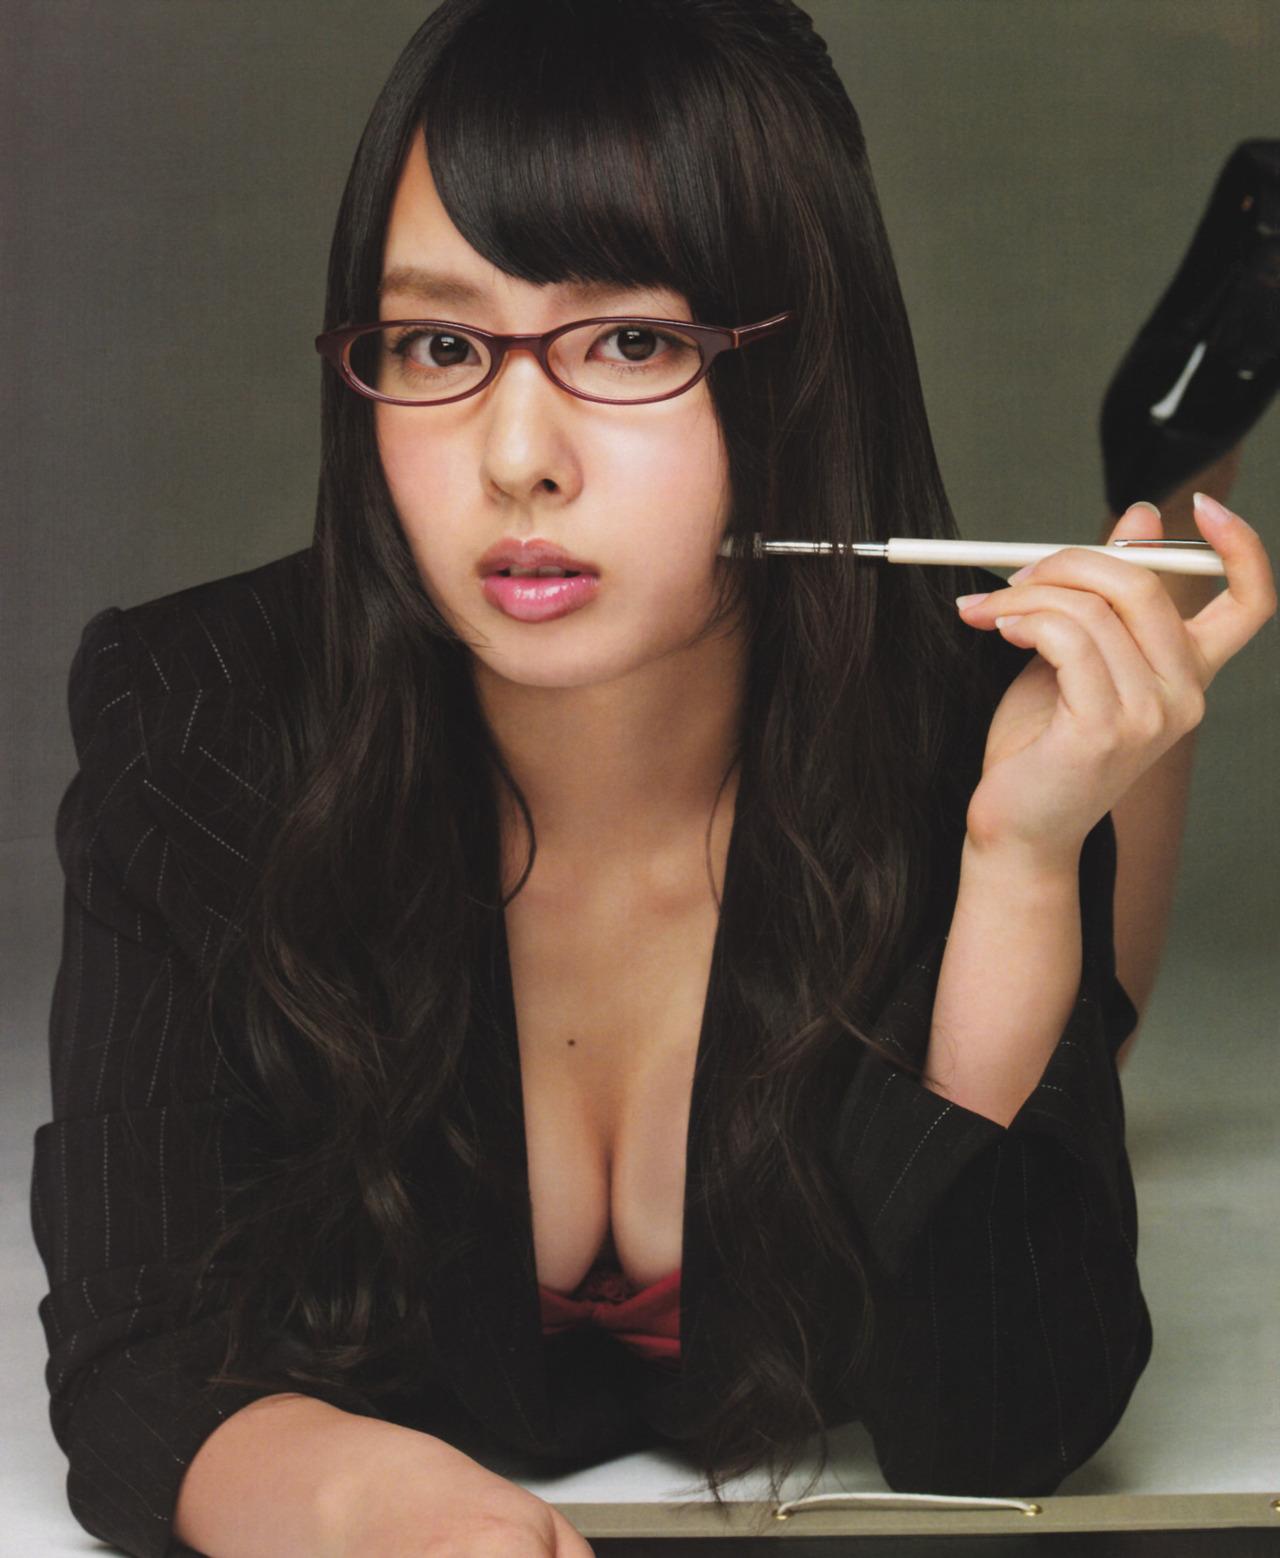 Nana Yamada HEBIROTE AKB48 Photos Videos News NMB48 Nana Yamada